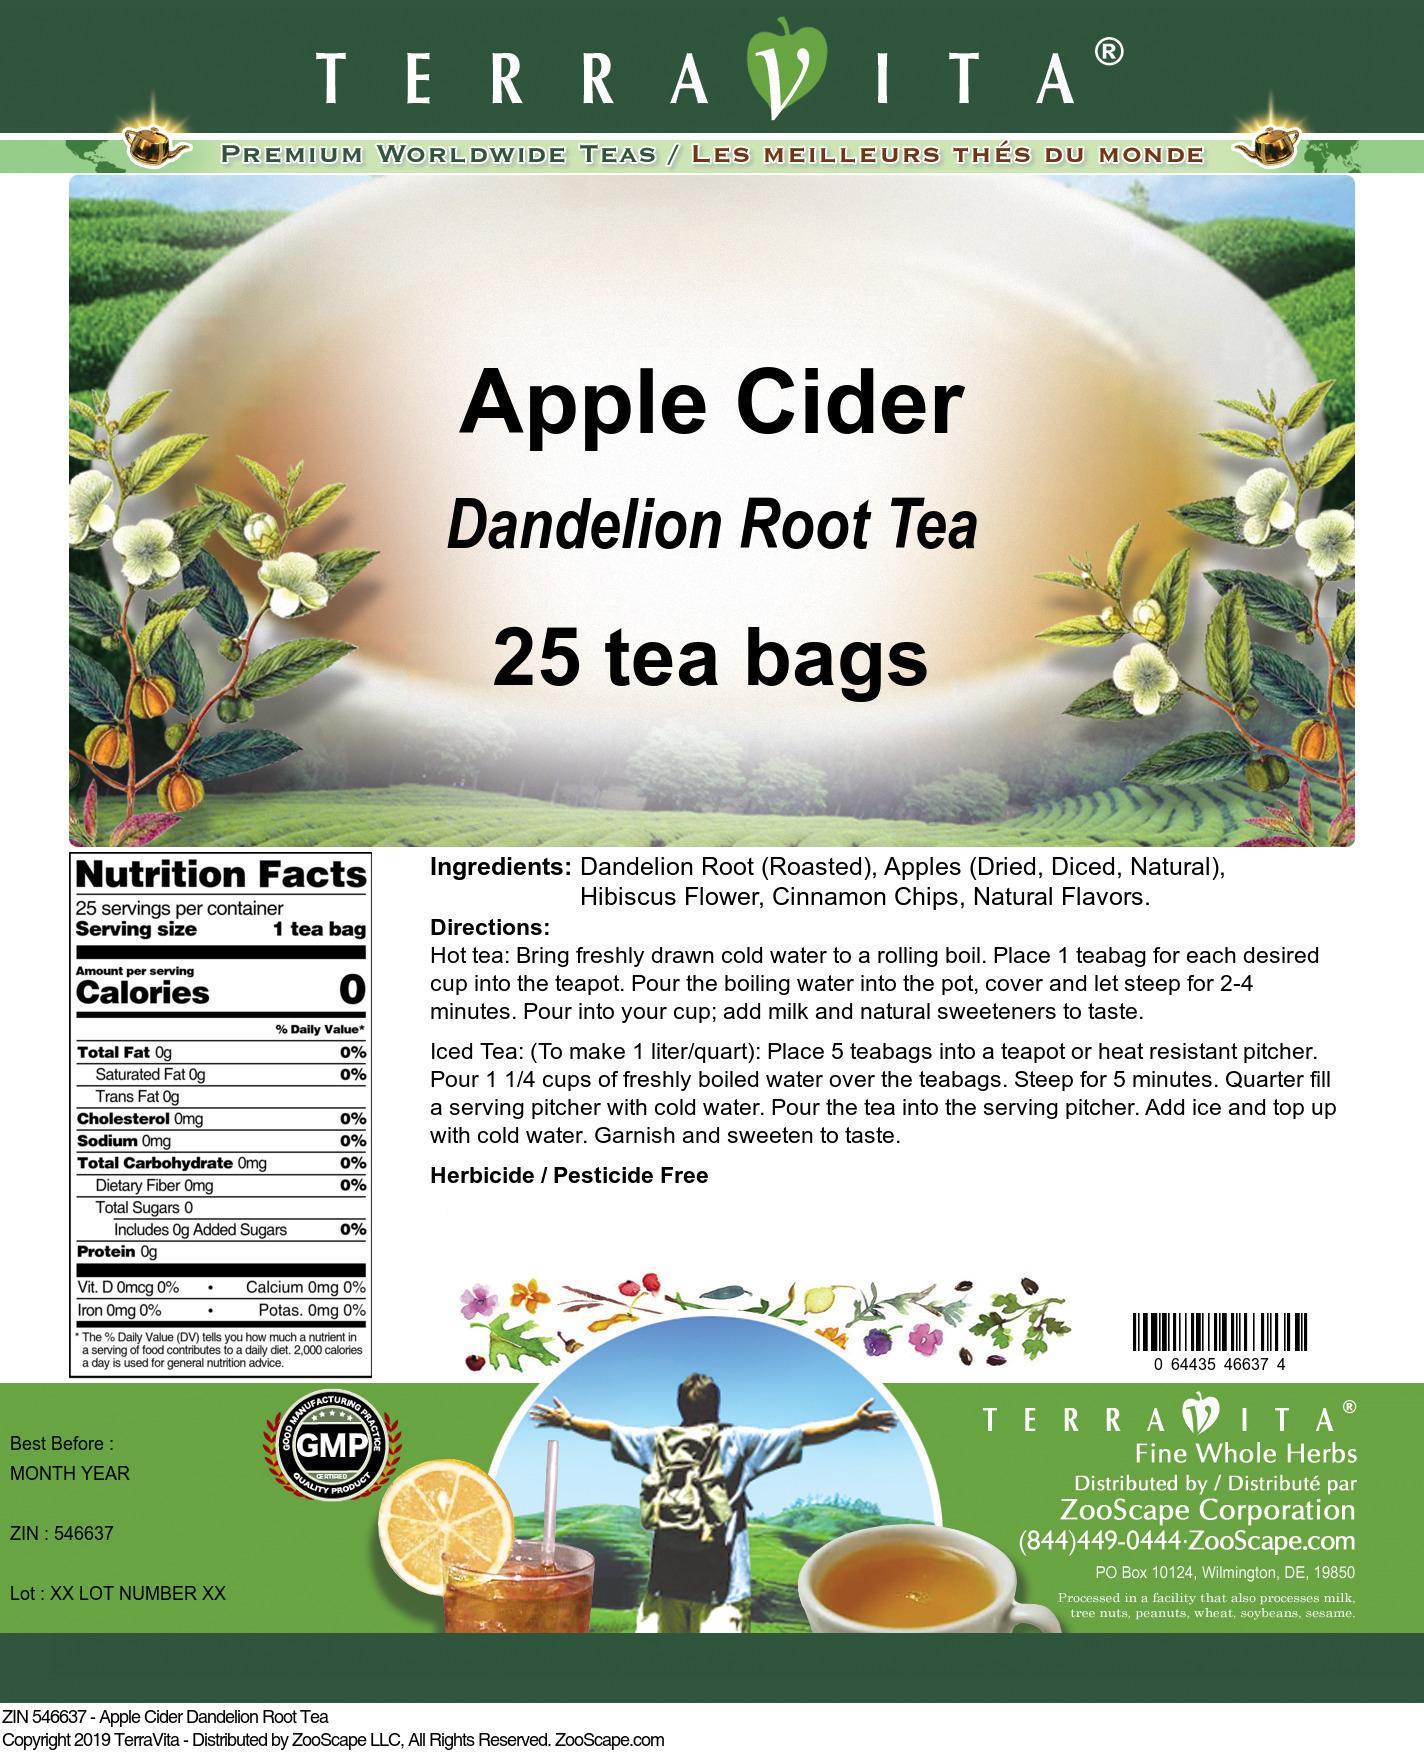 Apple Cider Dandelion Root Tea